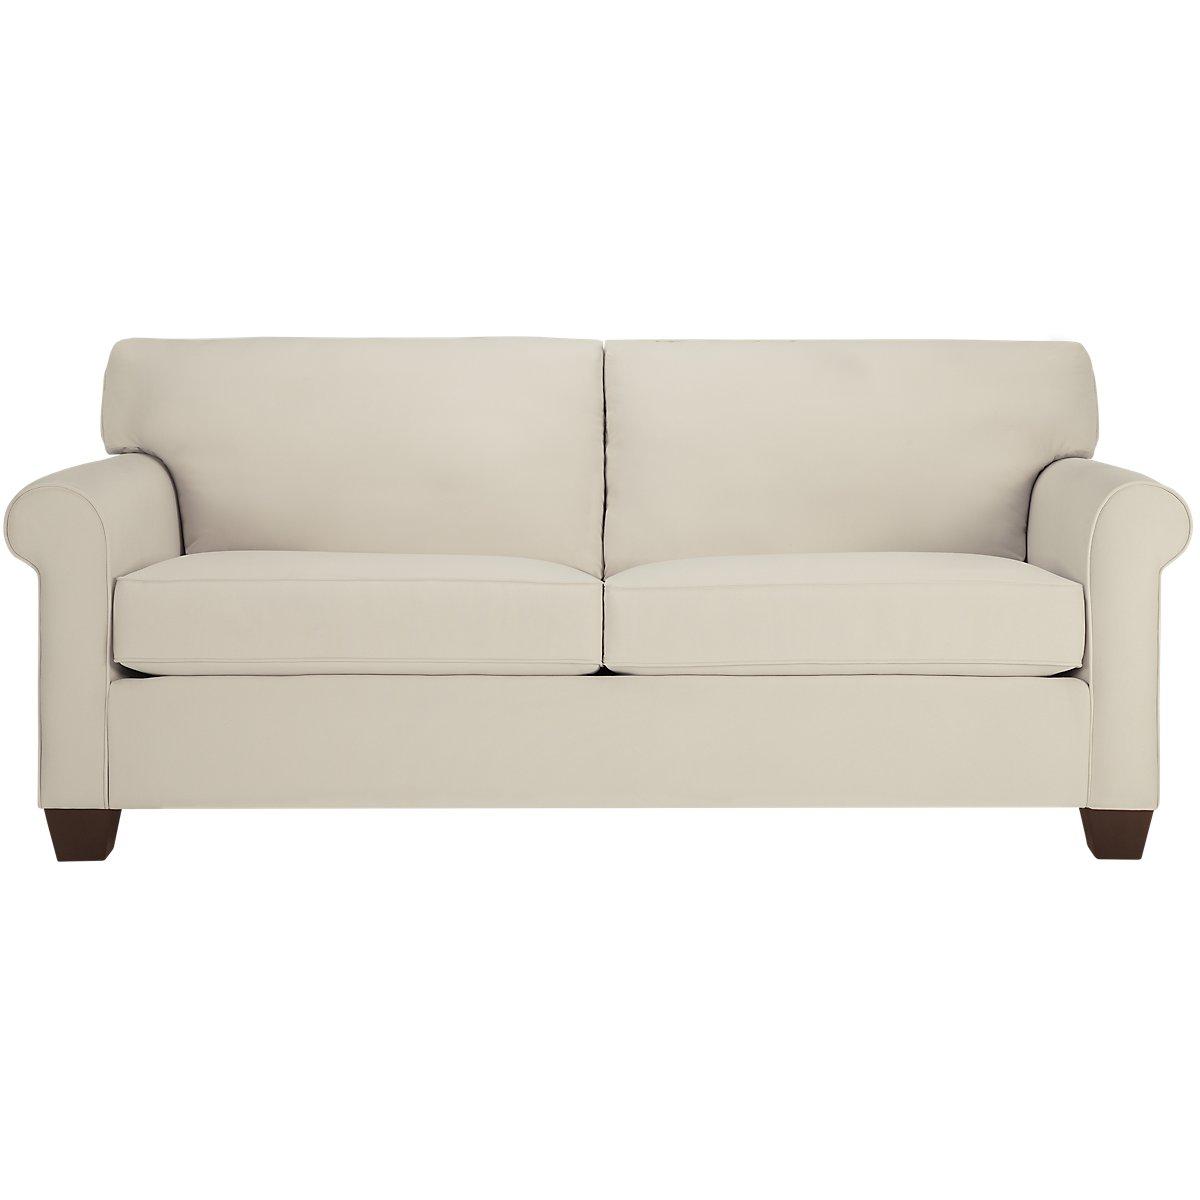 City furniture corlis lt beige fabric sofa for Couch beige